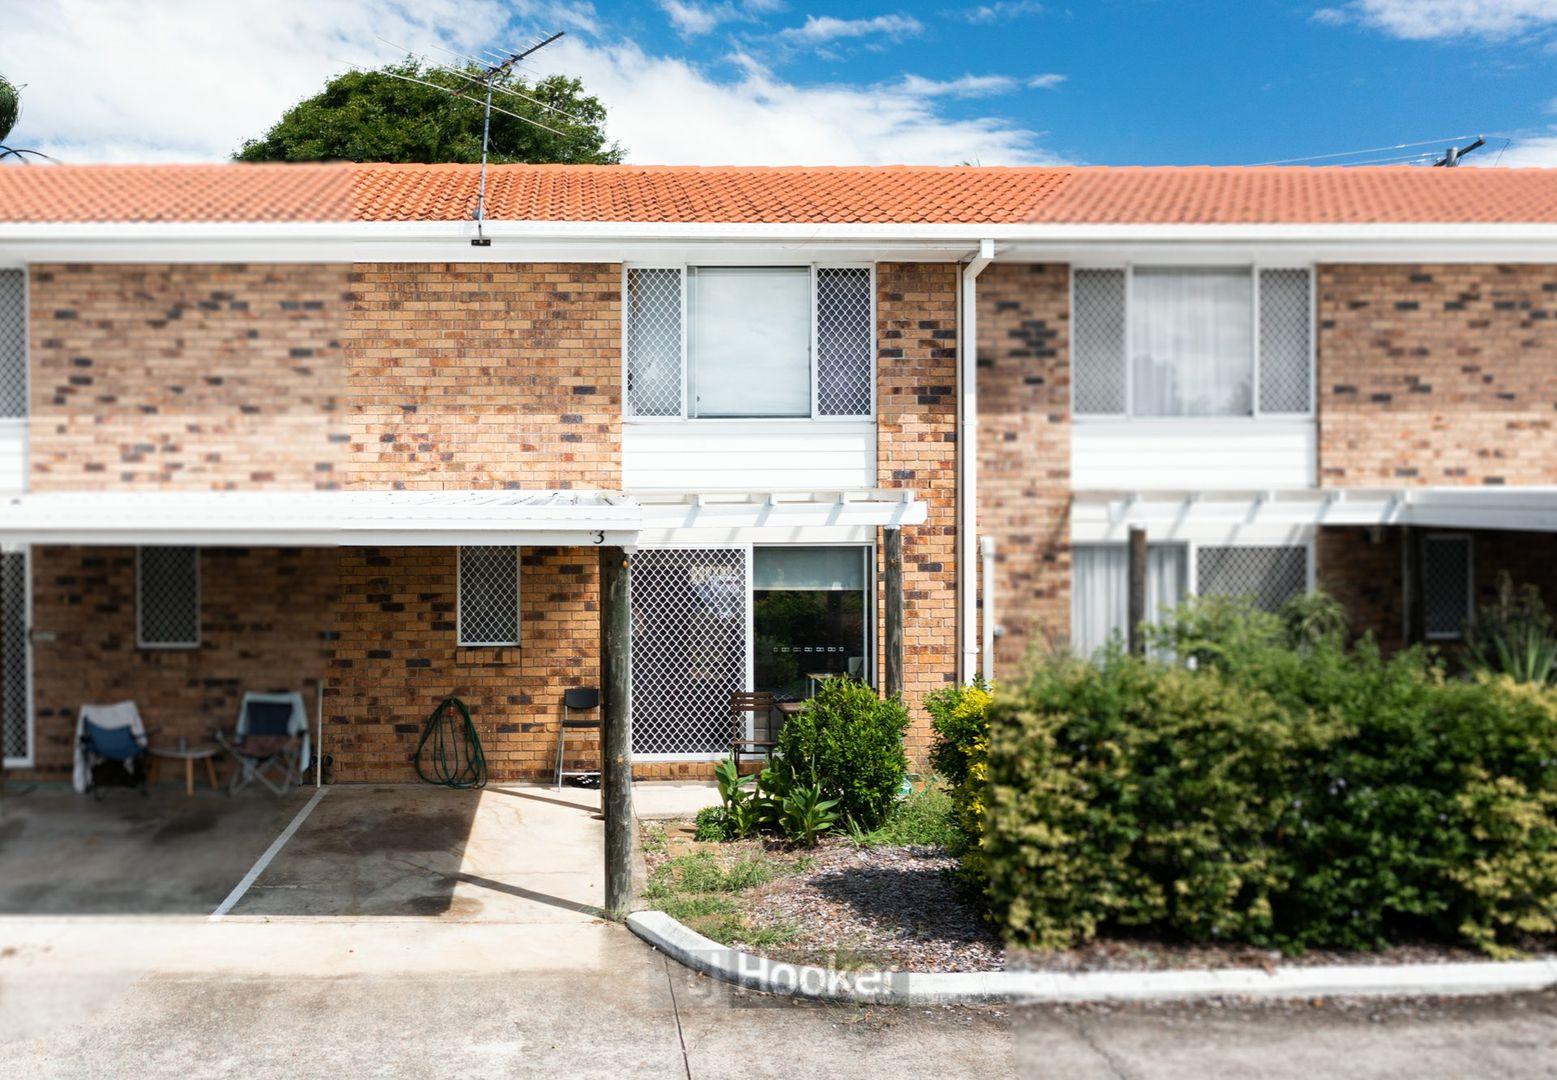 3/54 Monash Road, Loganlea QLD 4131, Image 0